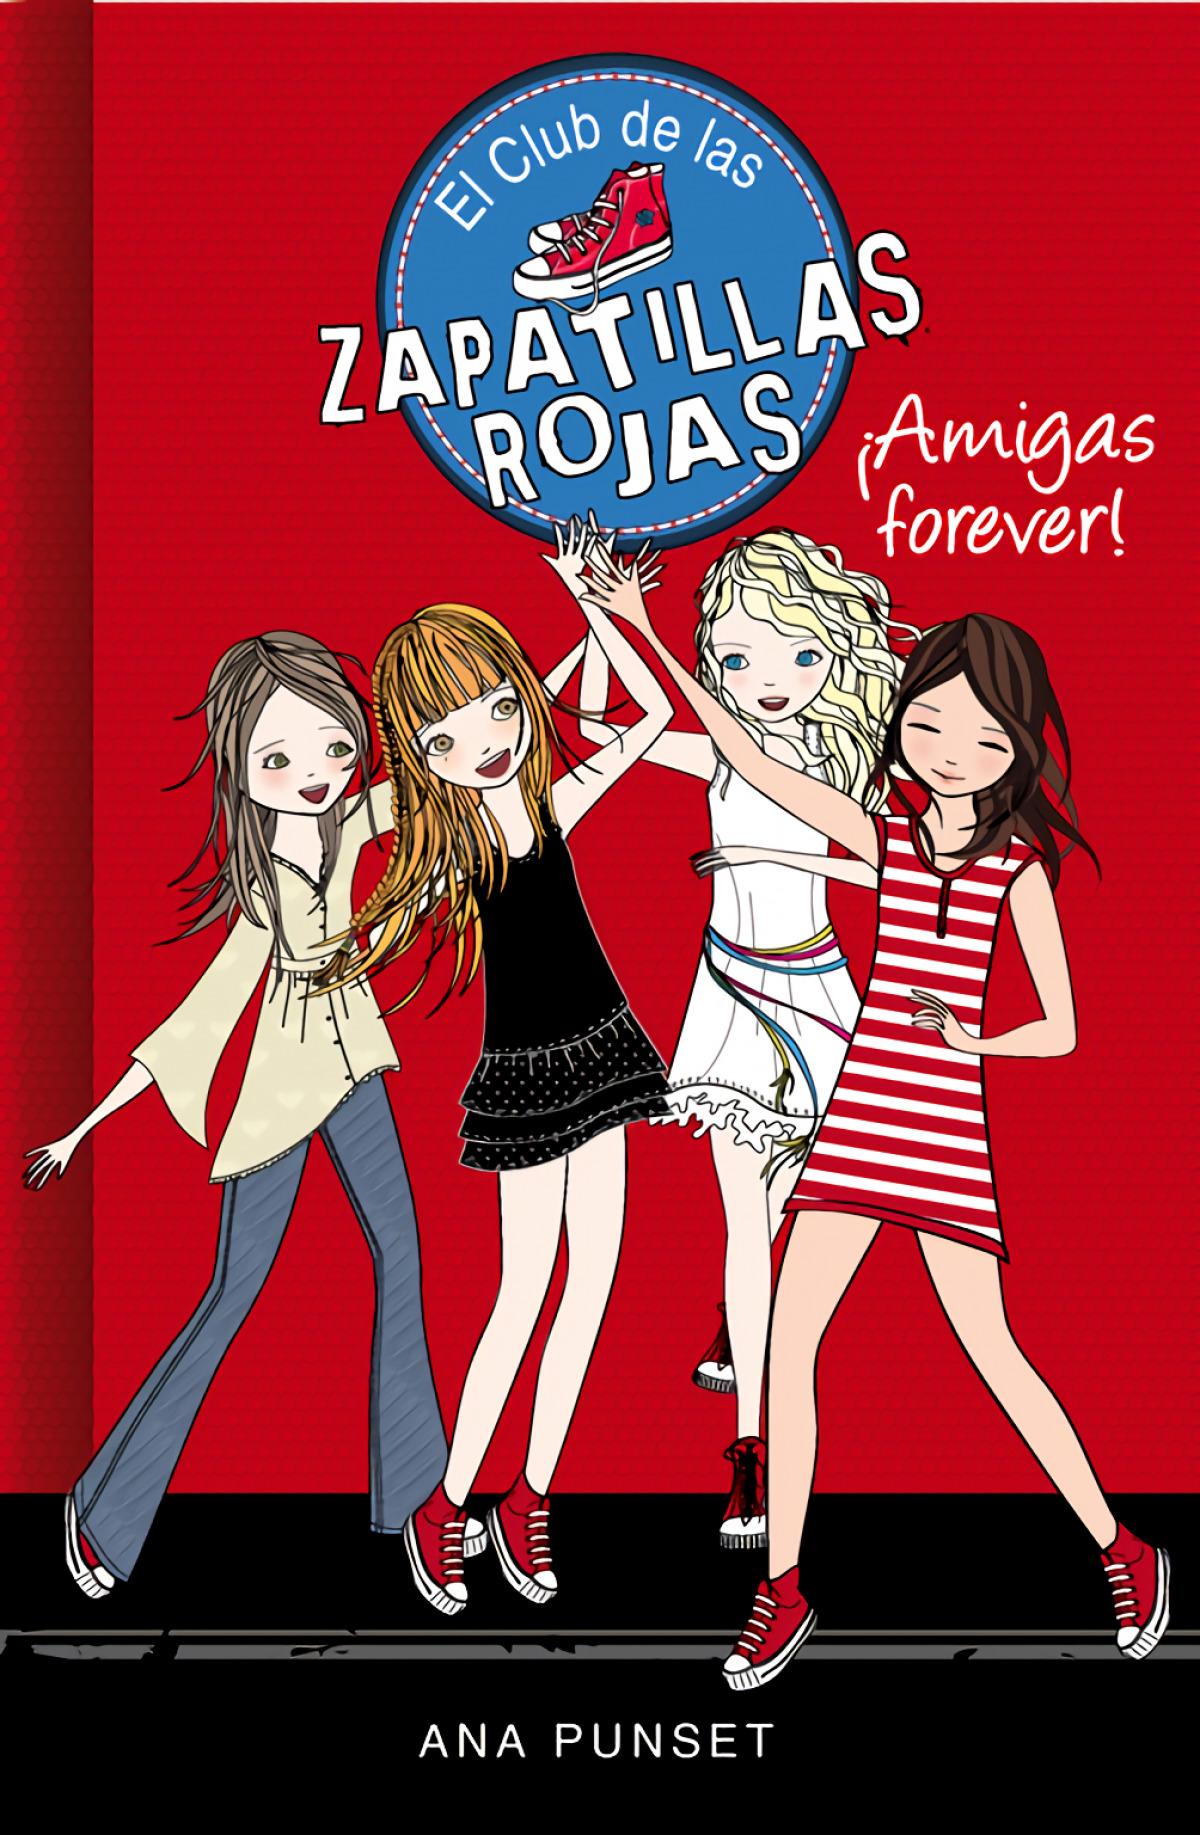 ¡Amigas forever! 9788415580744